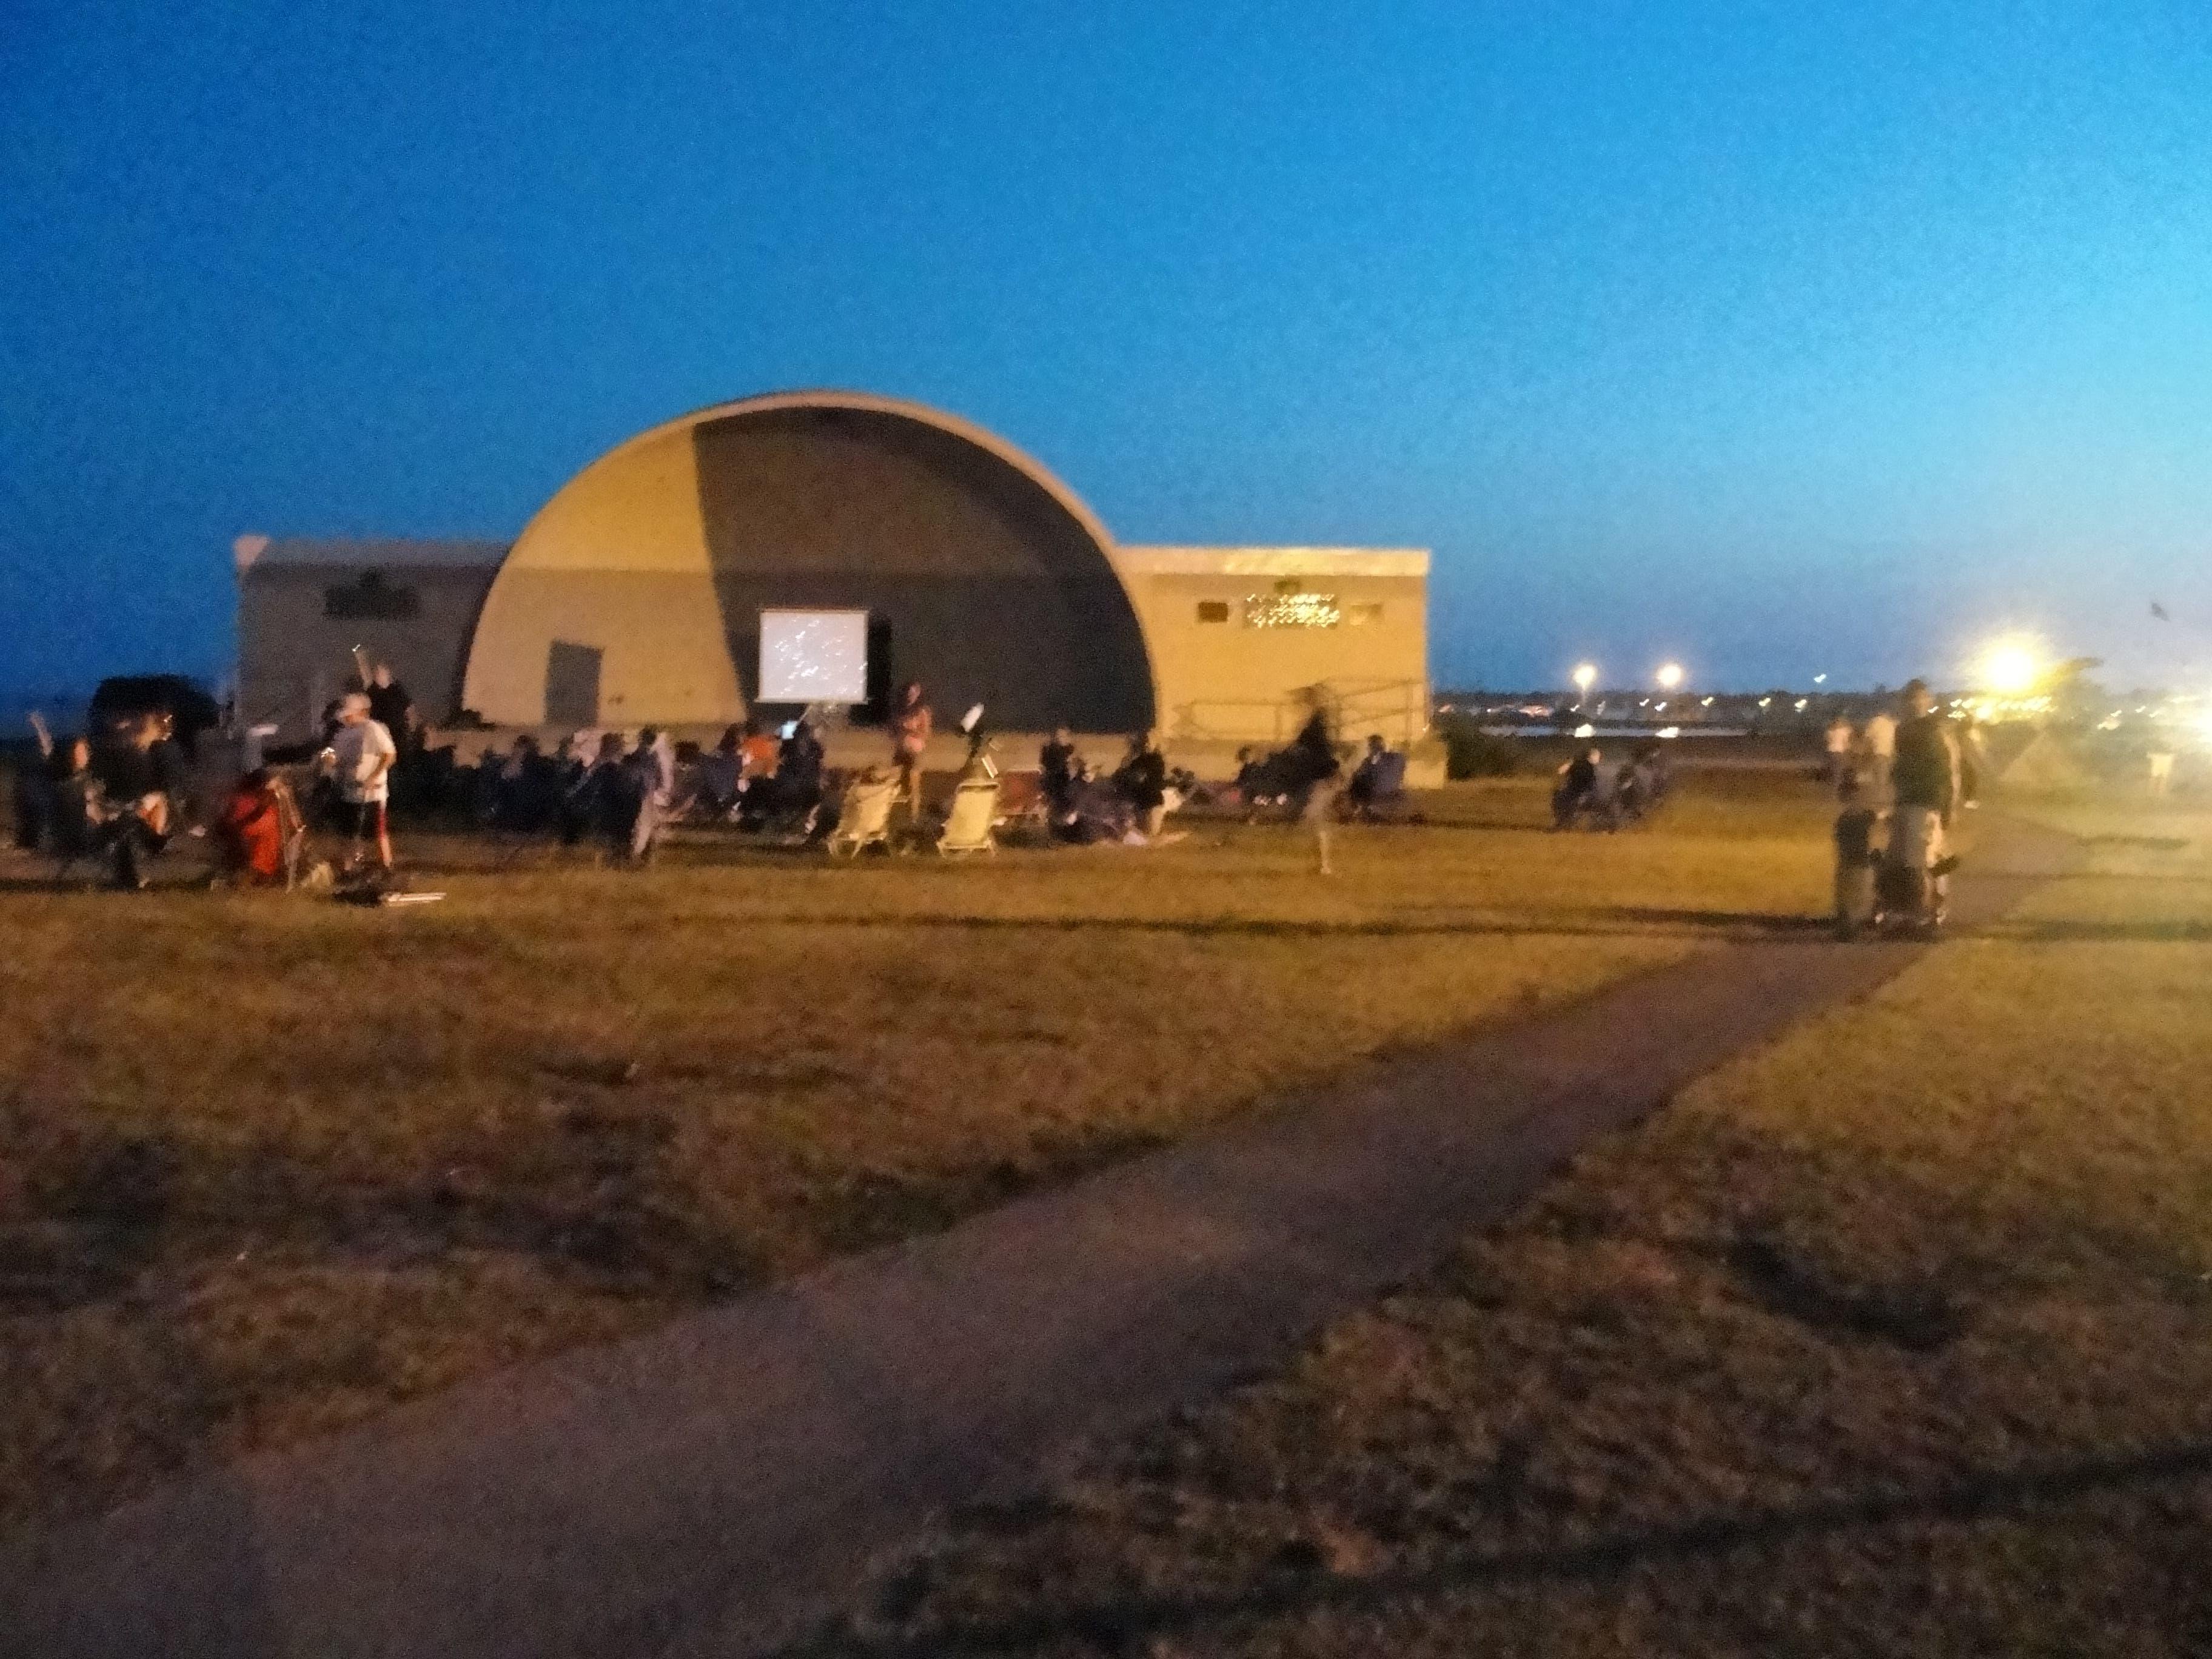 Stargazing at Shorefront Park | Patchogue, NY Patch